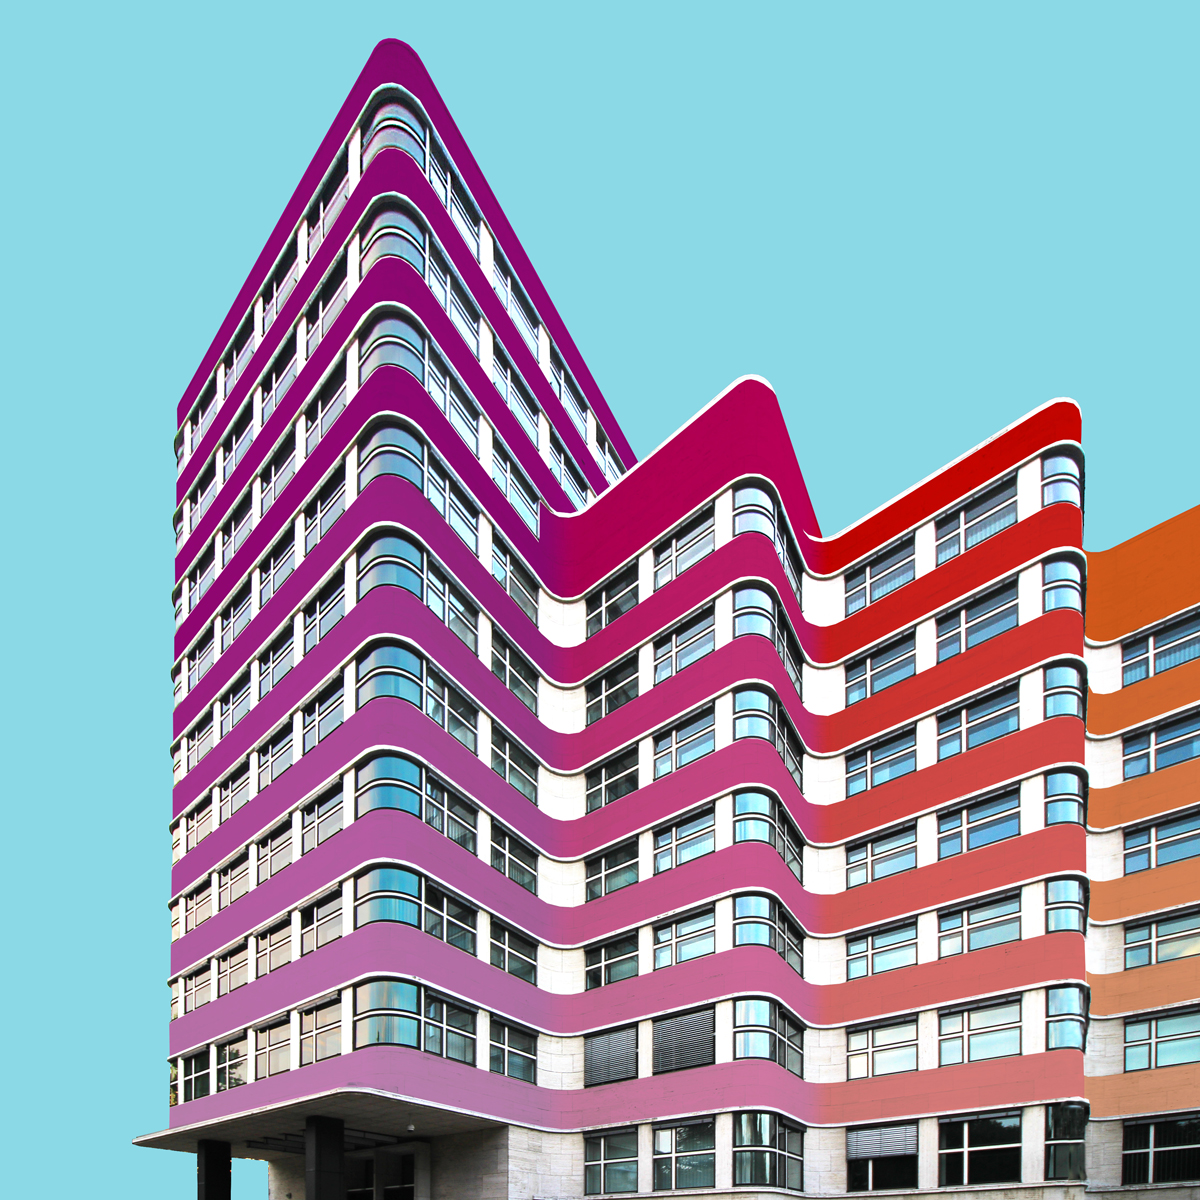 paul-eis-farbe-architektur7